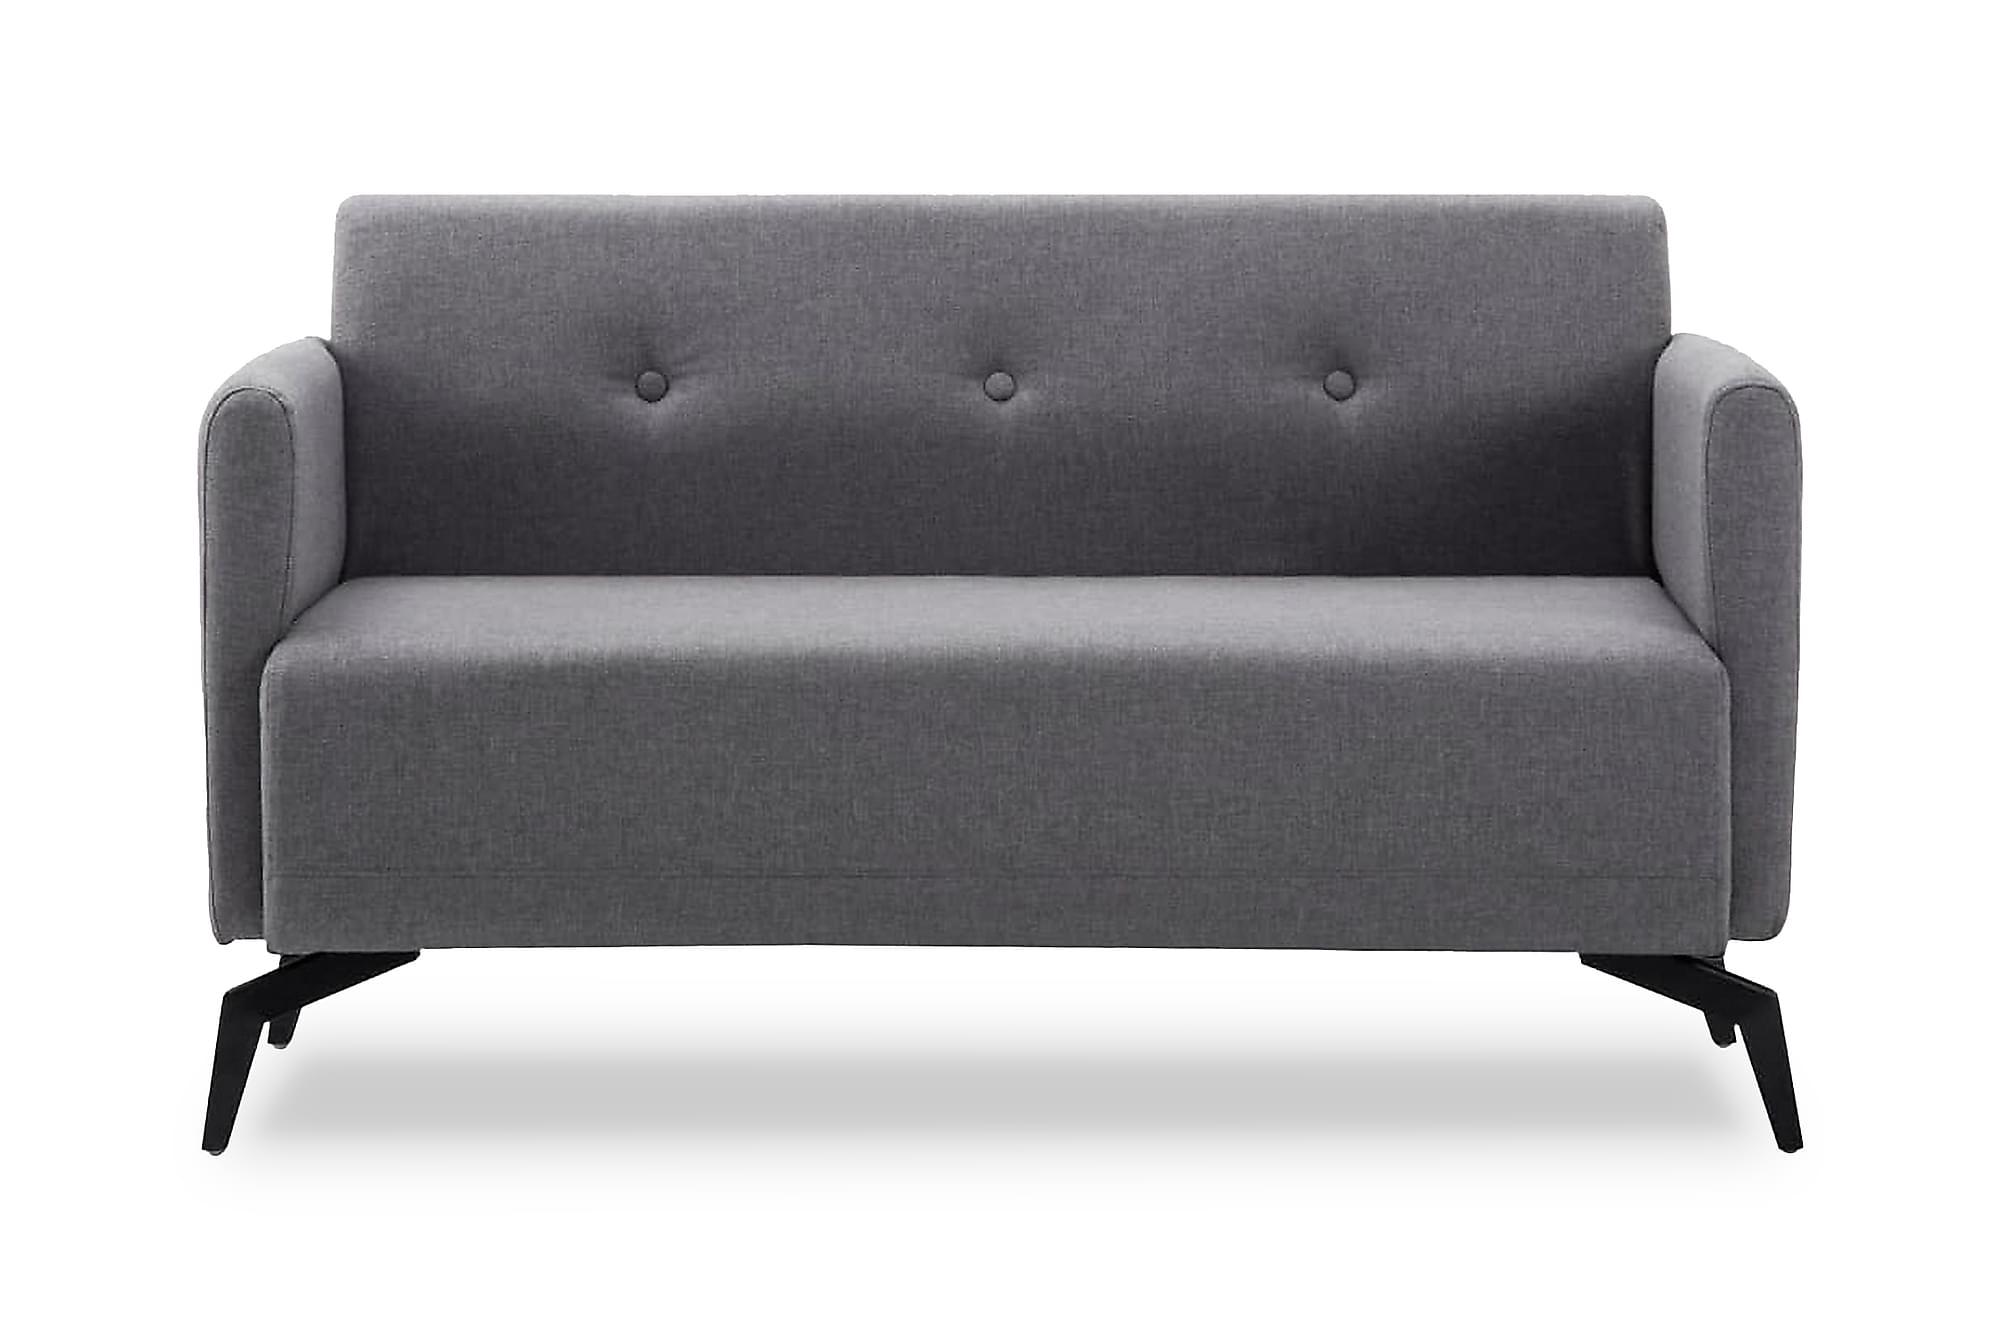 2-sitssoffa med tygklädsel 115x60x67 cm ljusgrå, 2-sits soffor